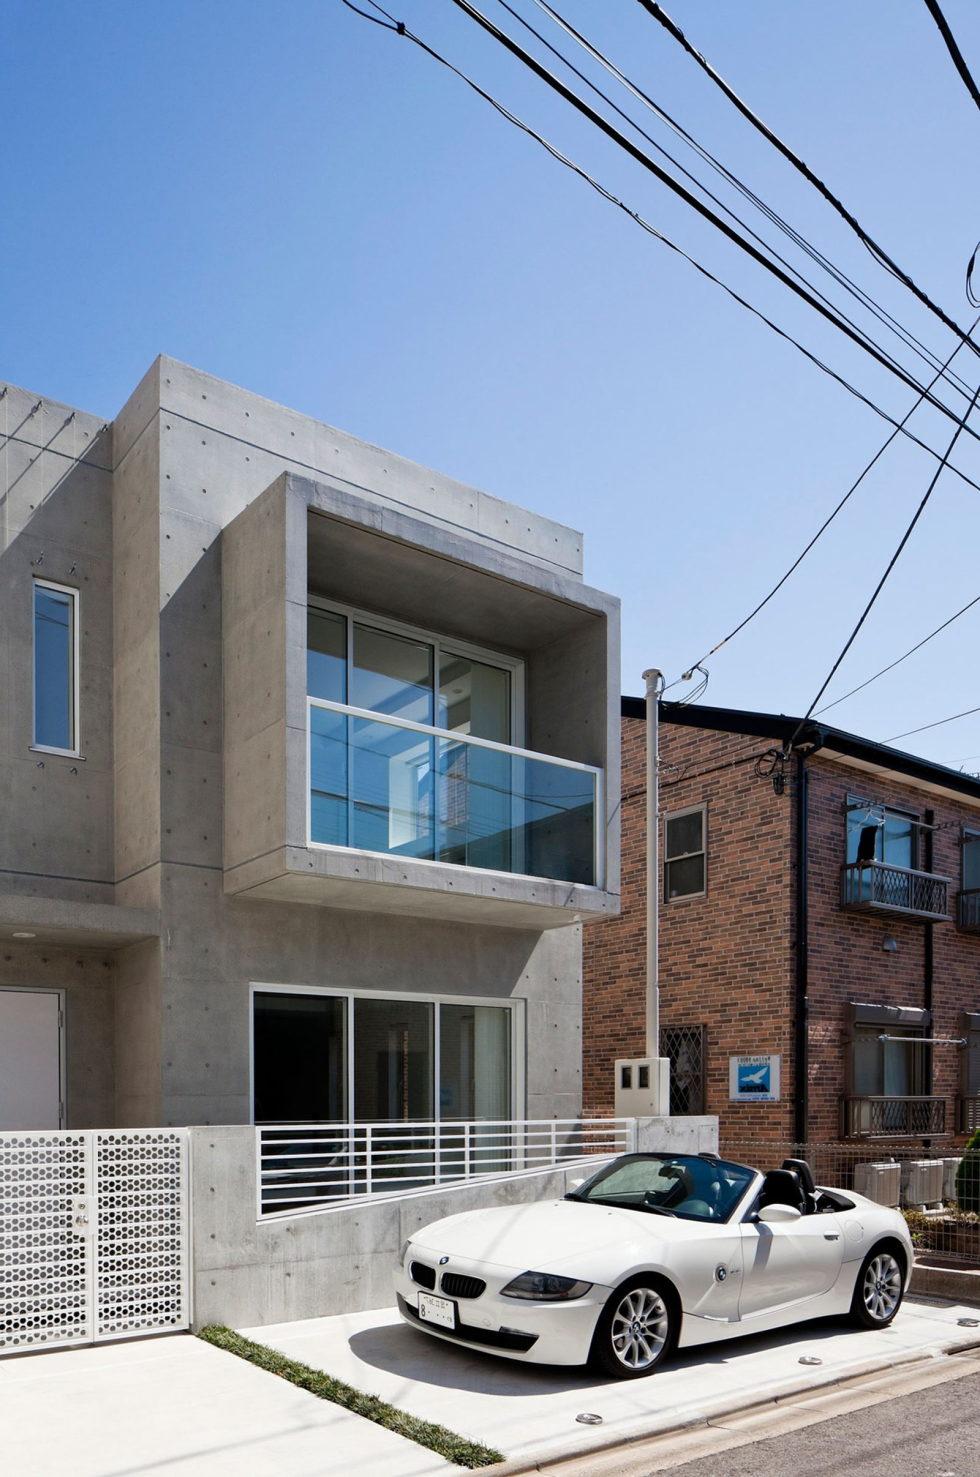 Zen Design House From RCK Design Studio In Japan 1